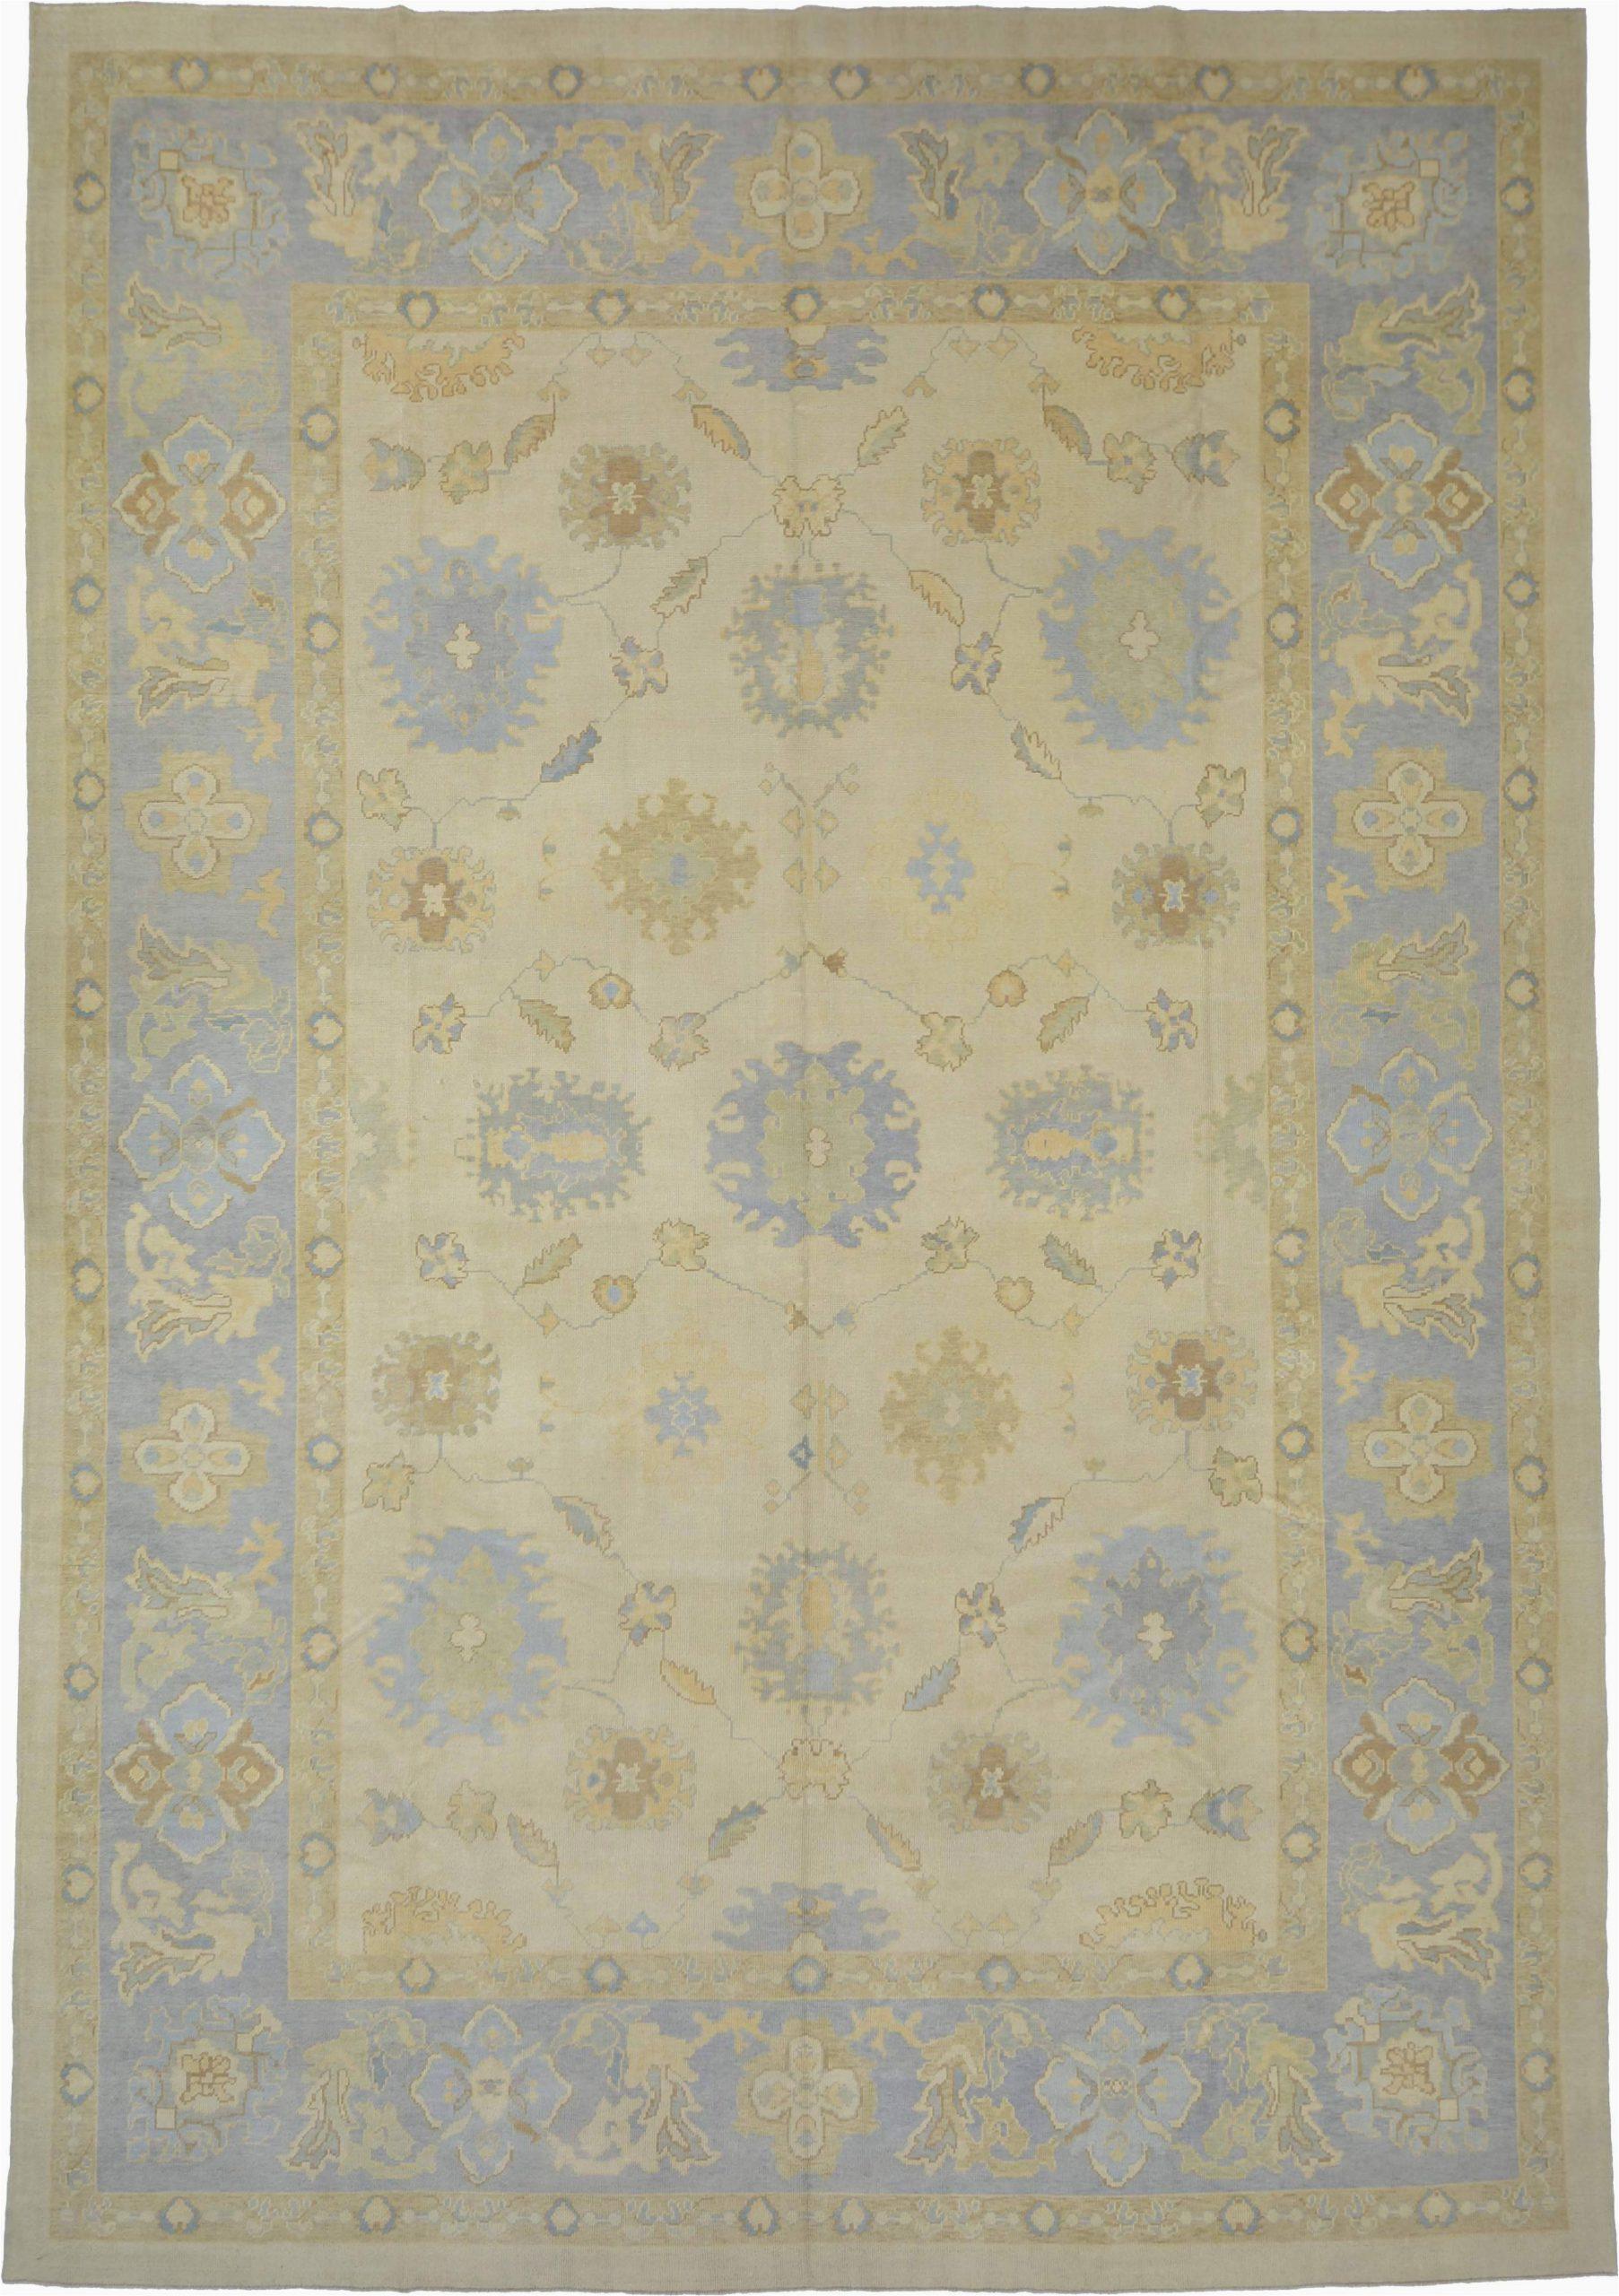 14x20 beige modern oushak area rug